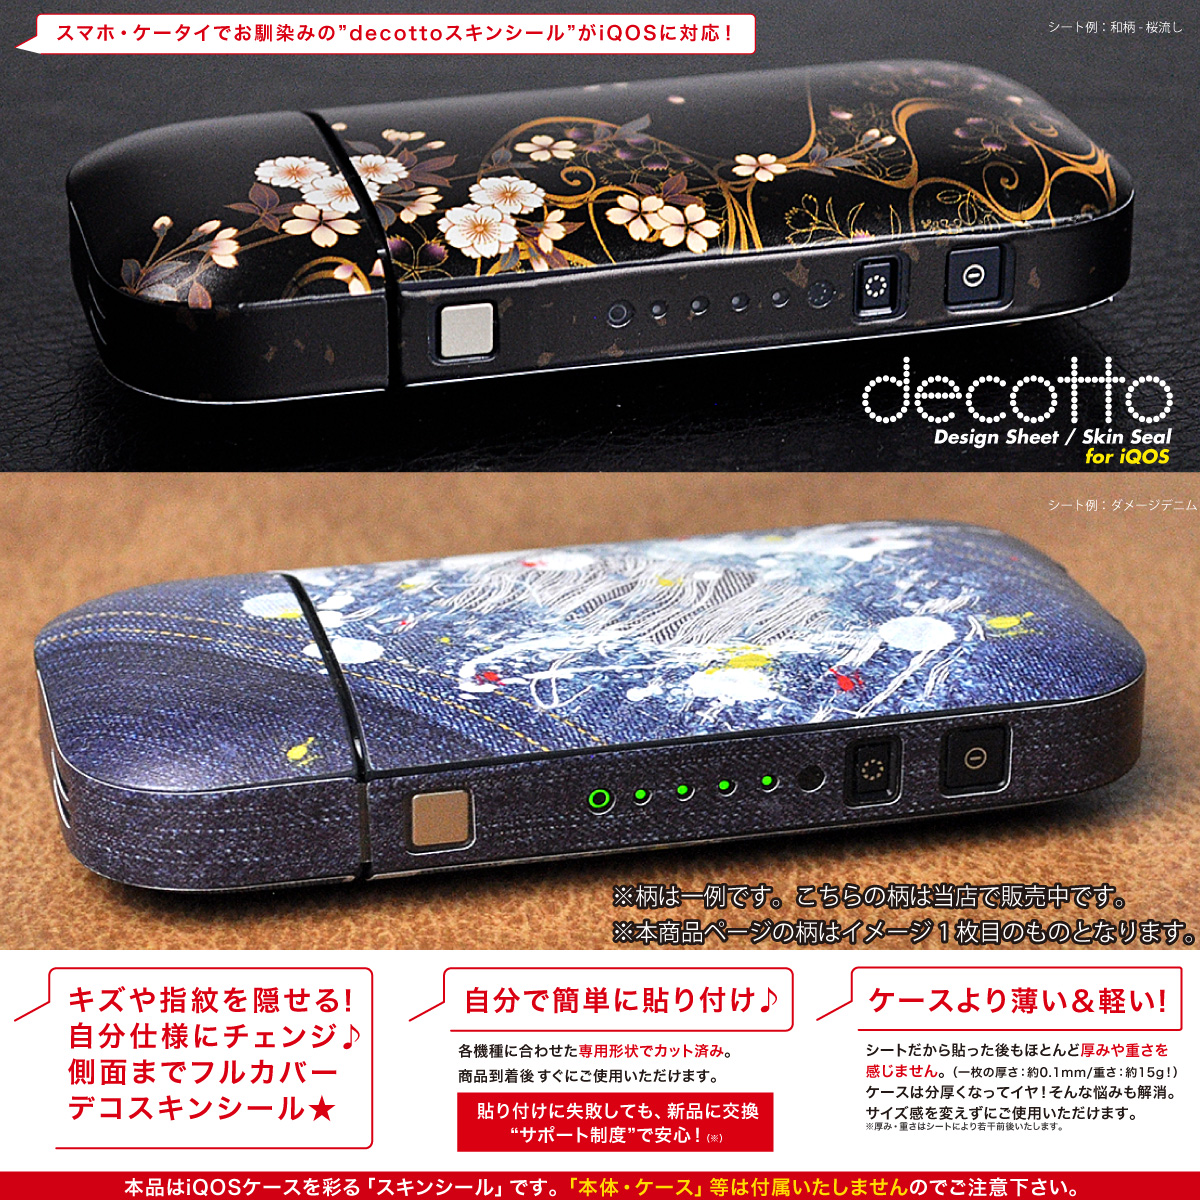 iQOS(アイコス) 専用 デコレーション スキンシール 表面・裏面&側面セット 【 和柄 シリーズ 】